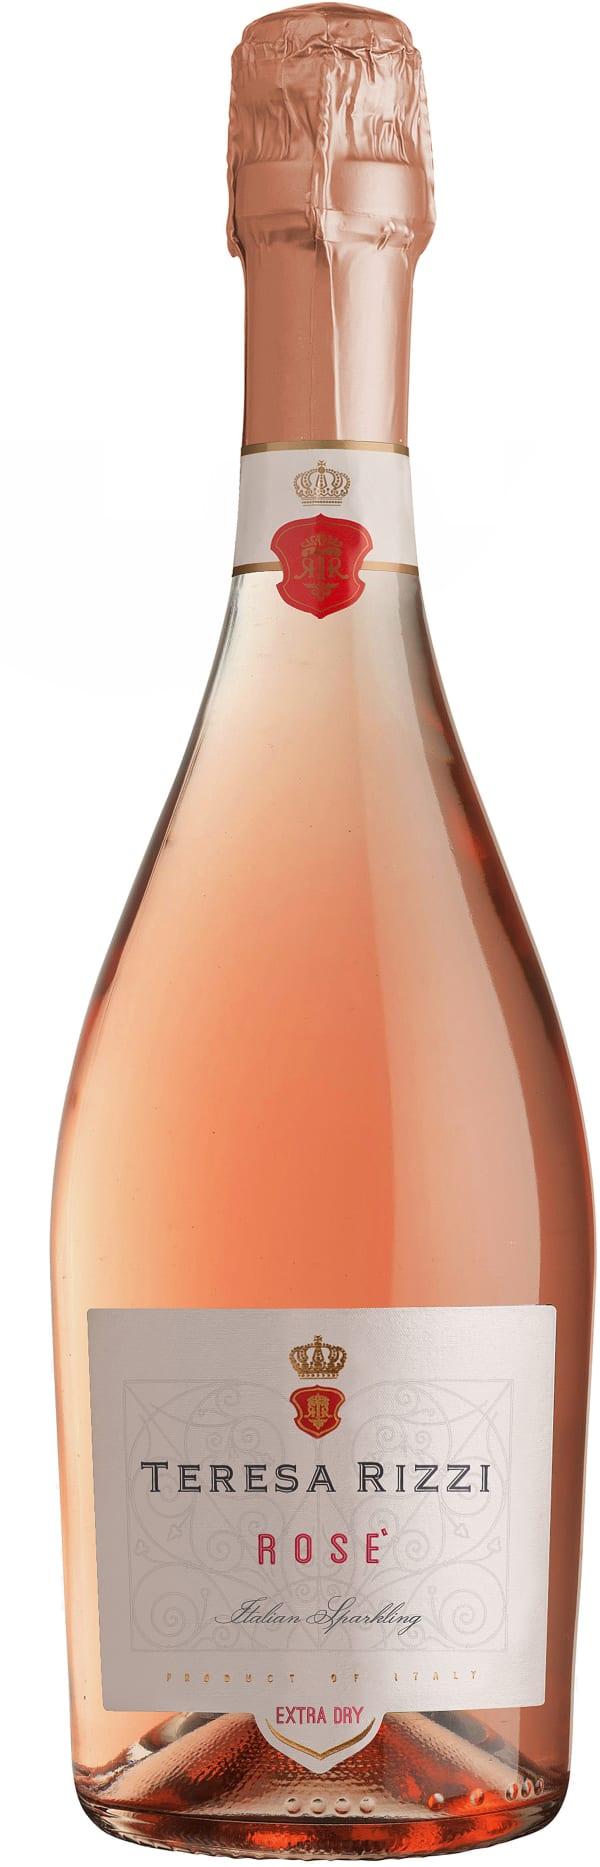 Teresa Rizzi Spumante Extra Dry Rosé